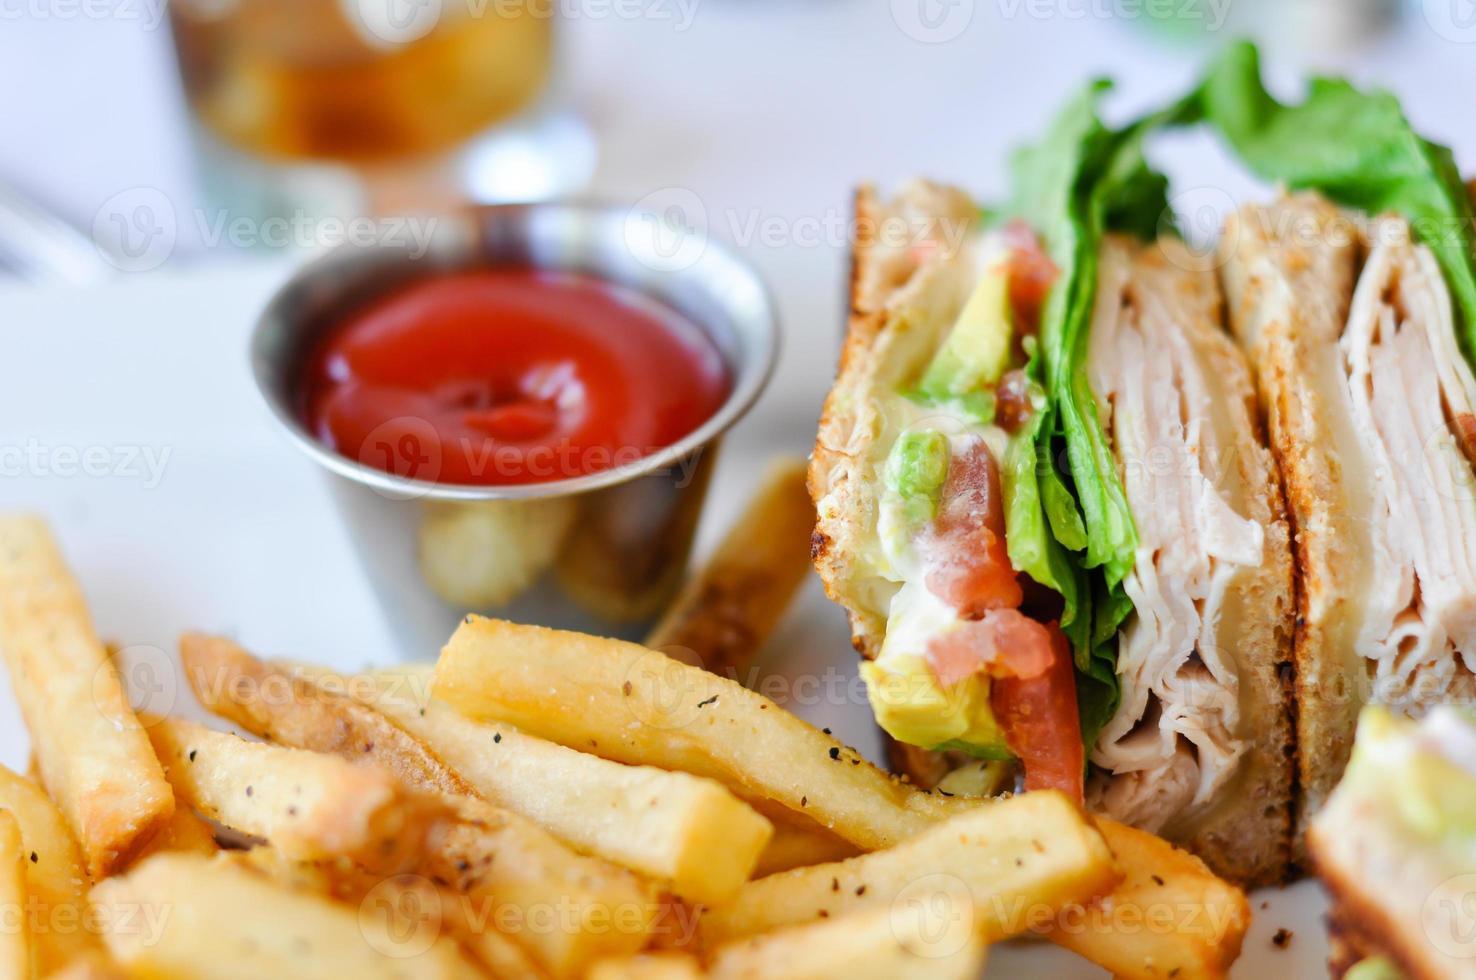 Turkije club sandwich foto